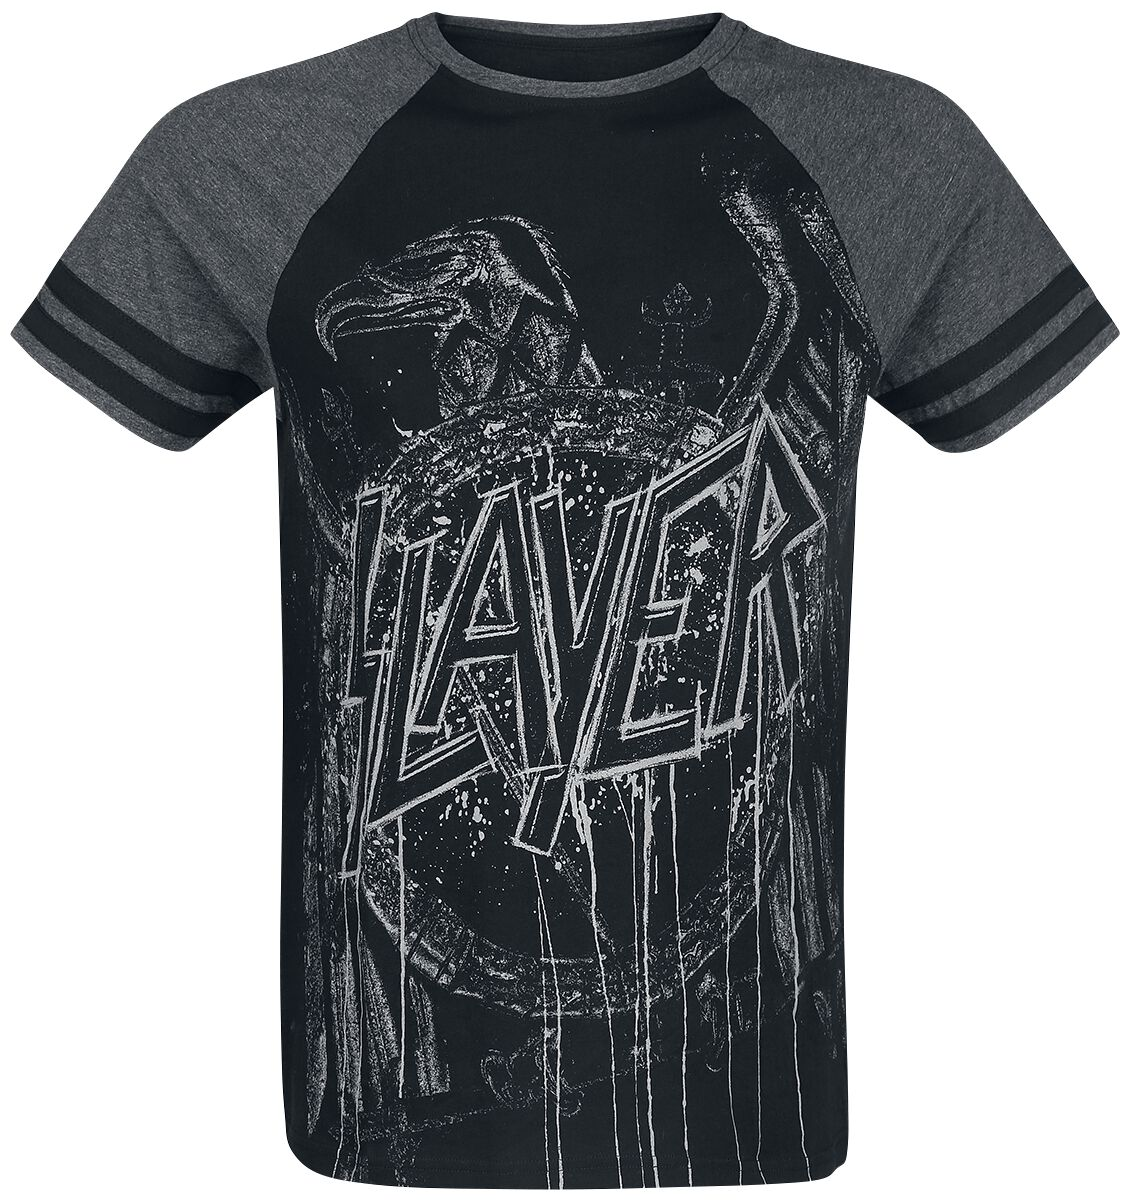 Image of   Slayer EMP Signature Collection T-Shirt sort-grå